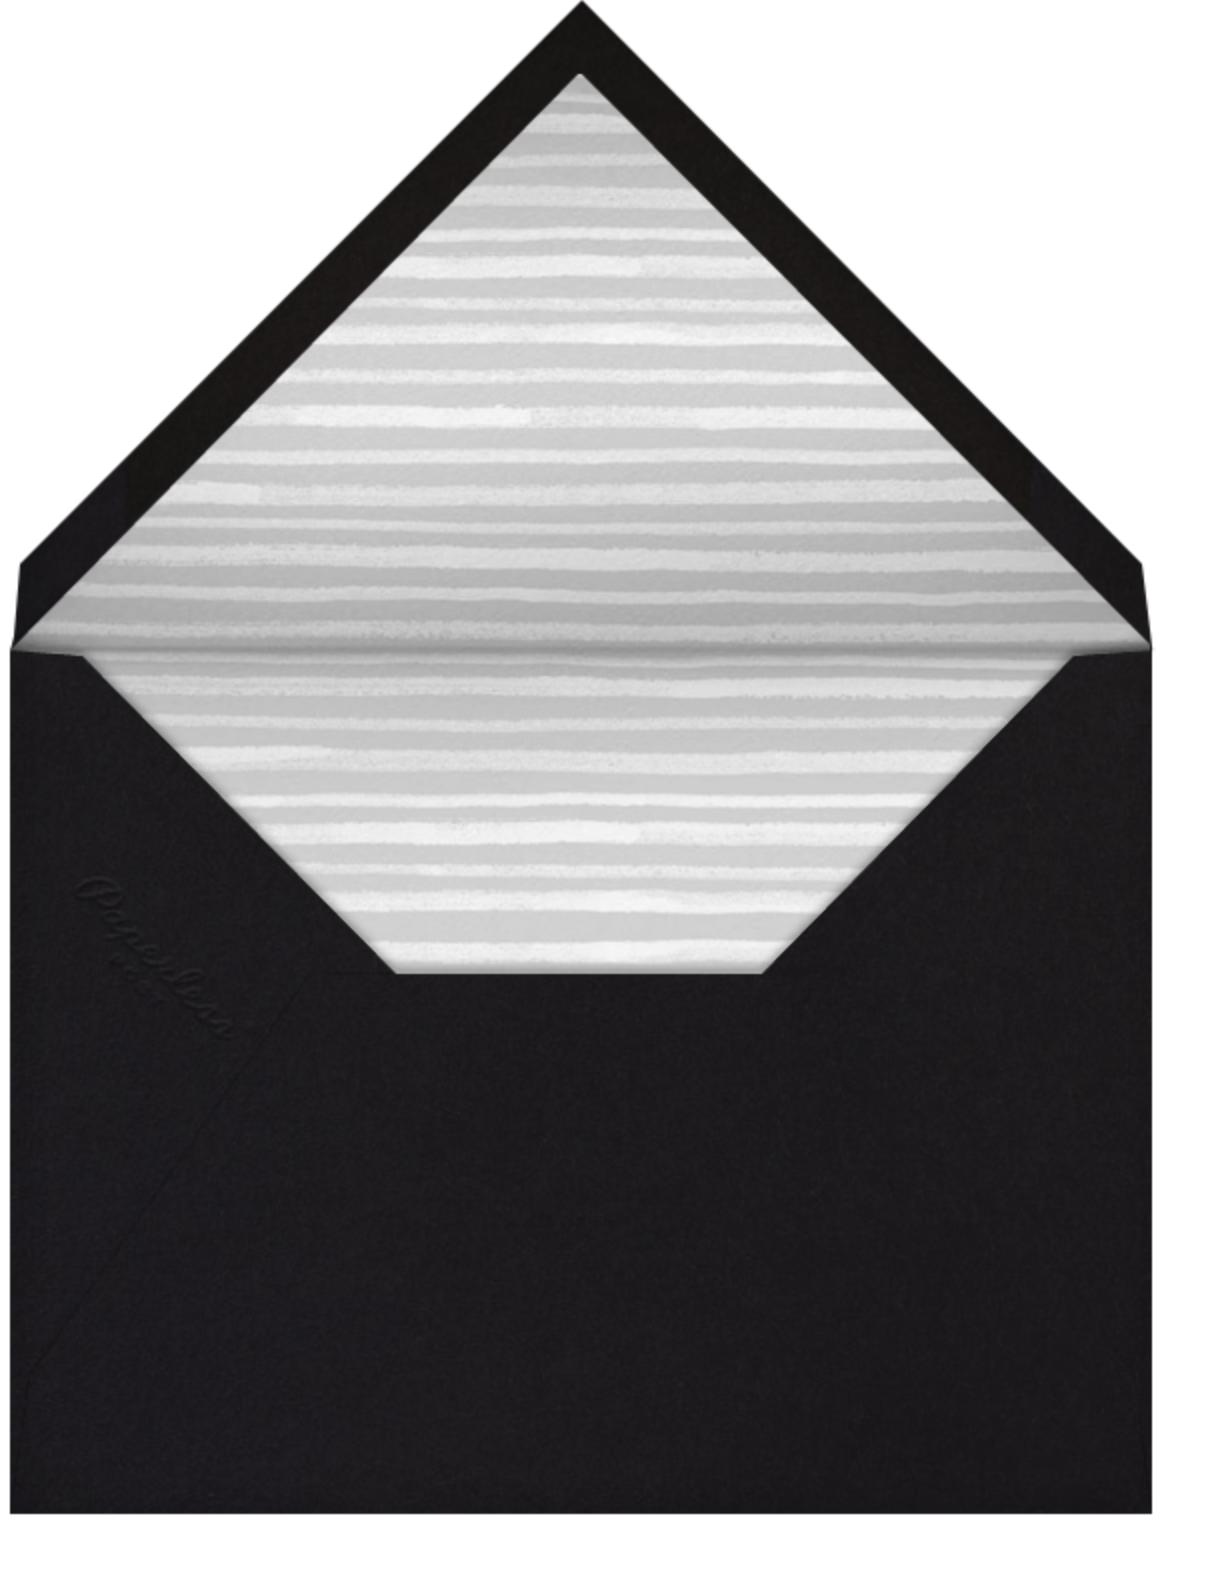 Wood Grain Color Block - Black - Paperless Post - Adult birthday - envelope back